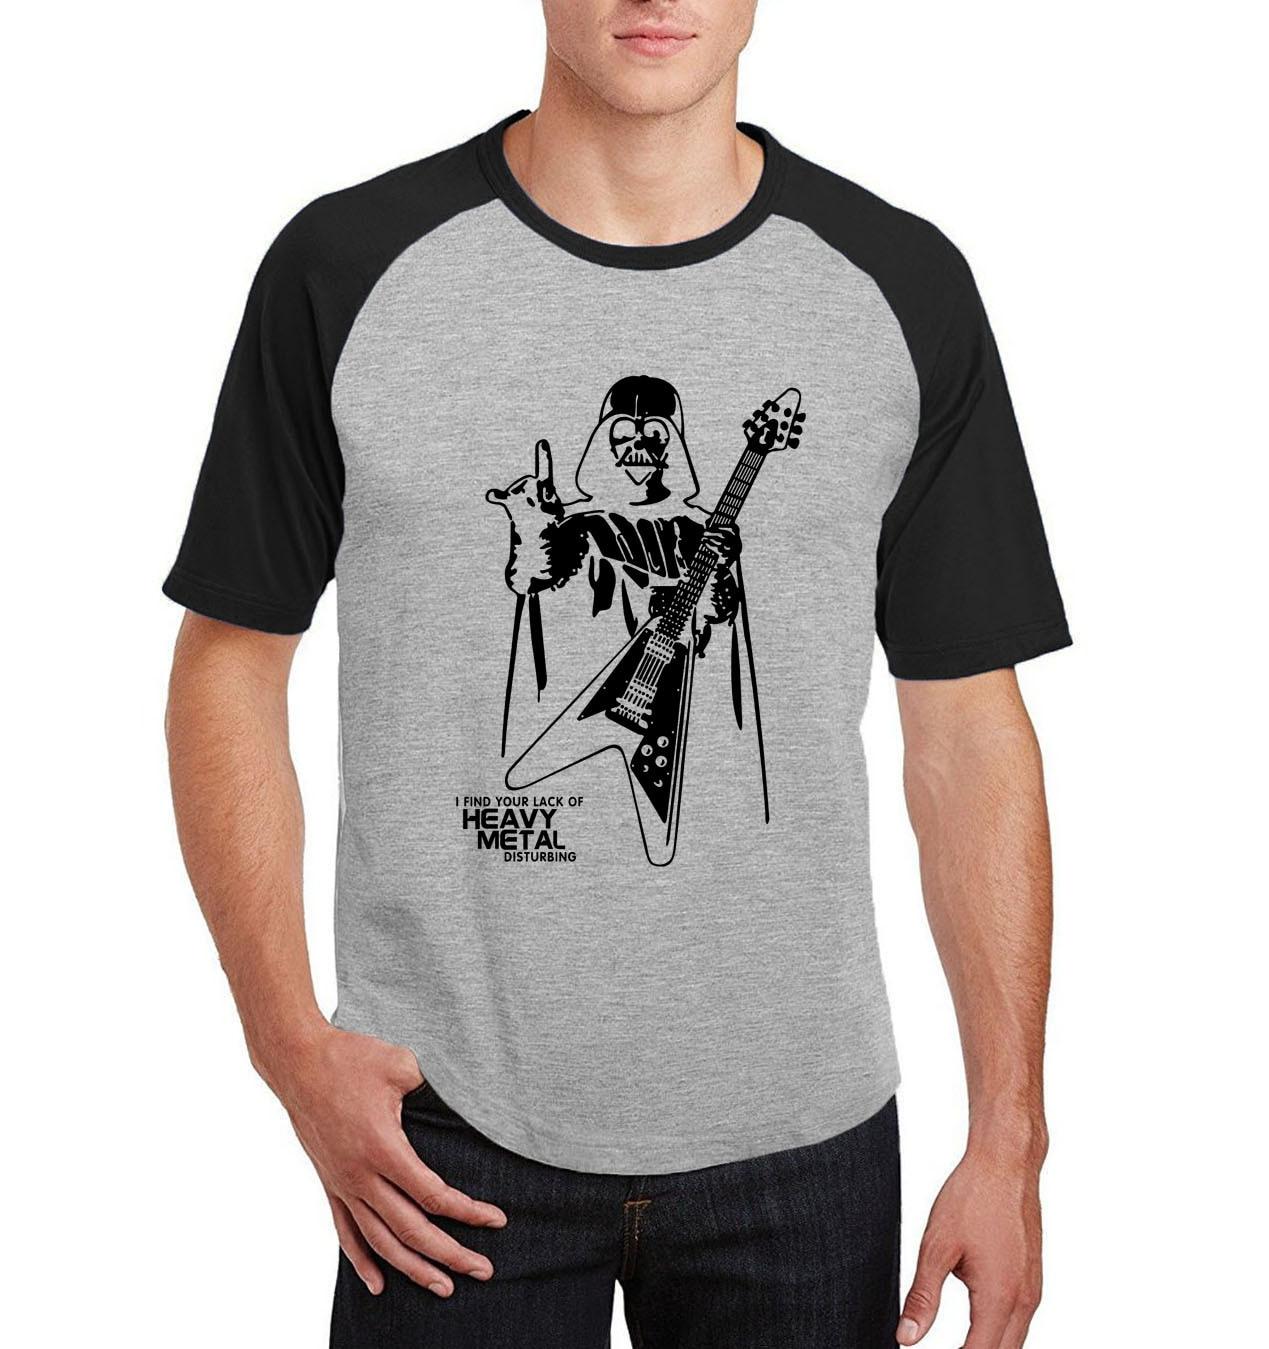 2019 summer  cotton fitness camisetas Men man's fitness top style short sleeve T Shirt harajuku hip hop raglan top